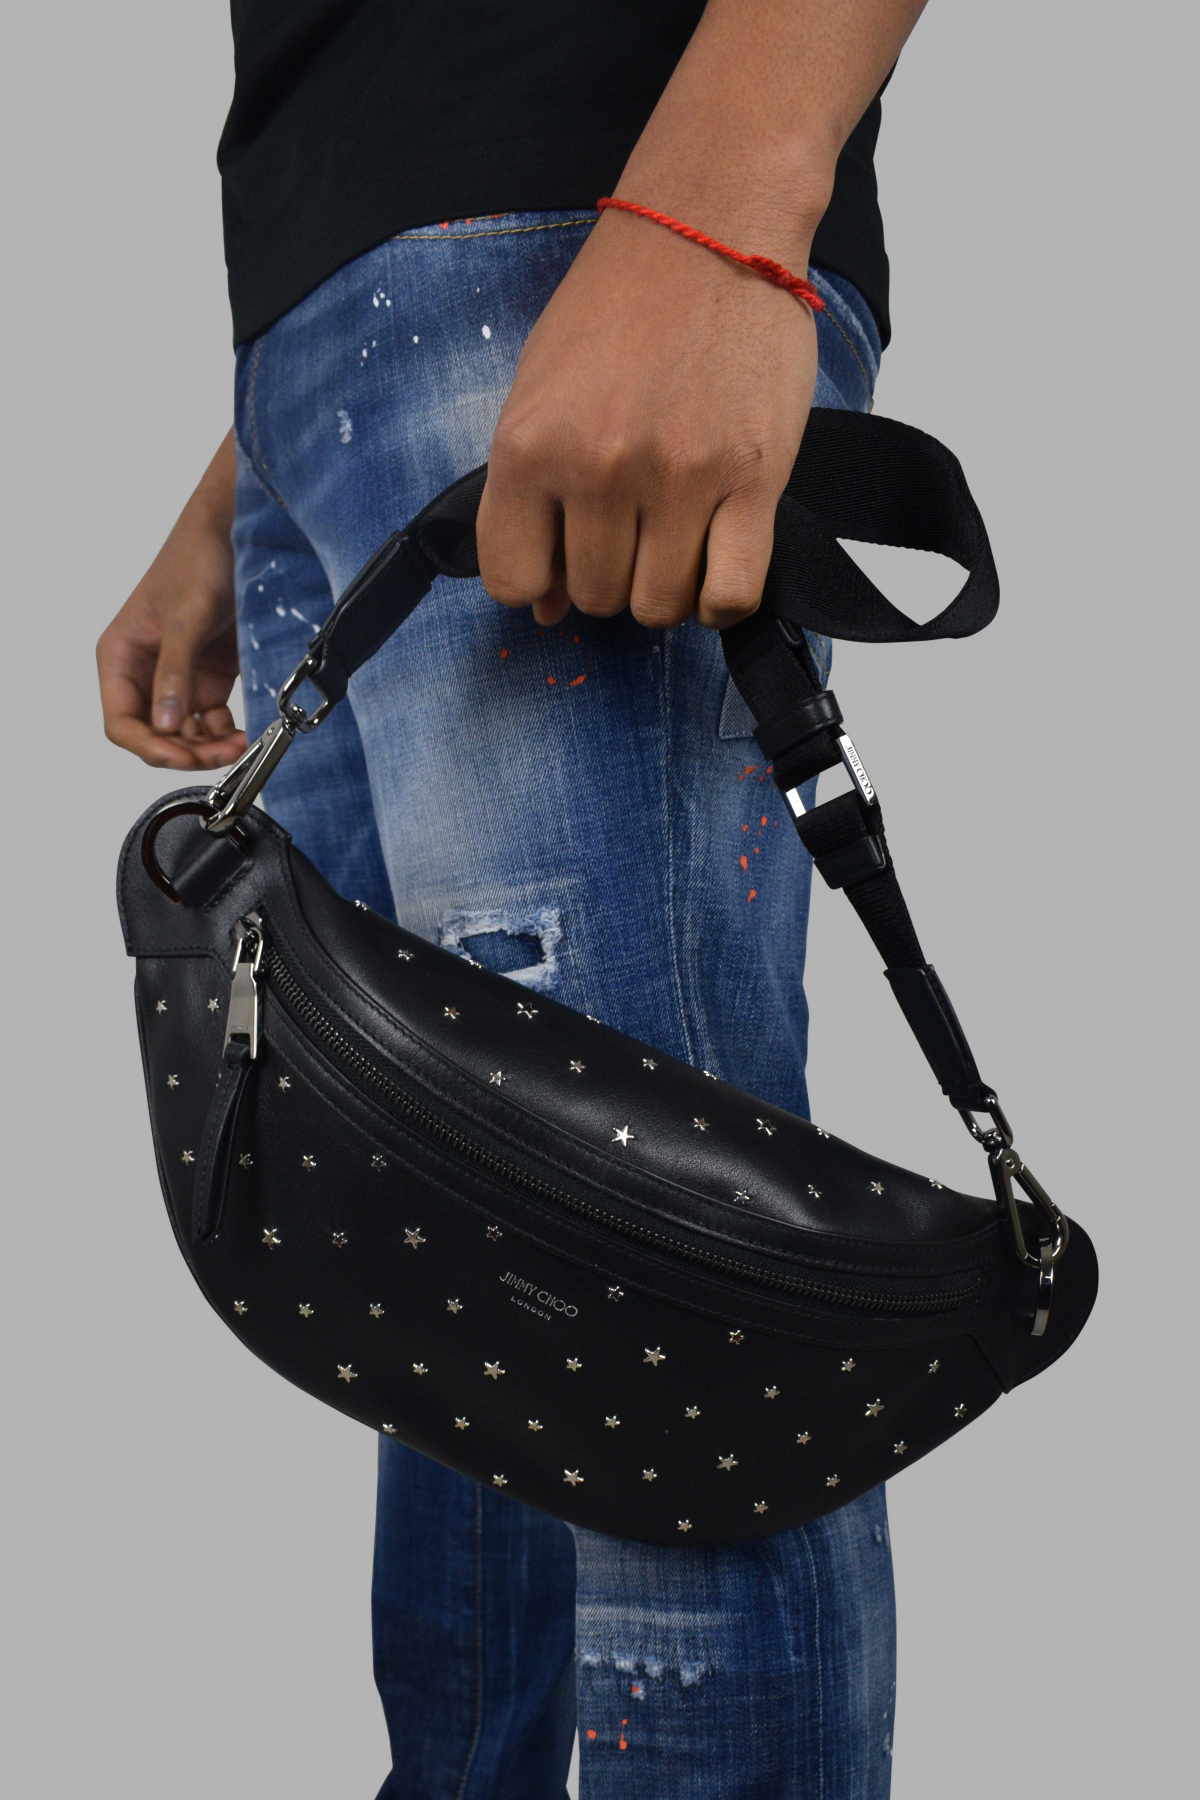 Jimmy Choo belt bag in black leather.